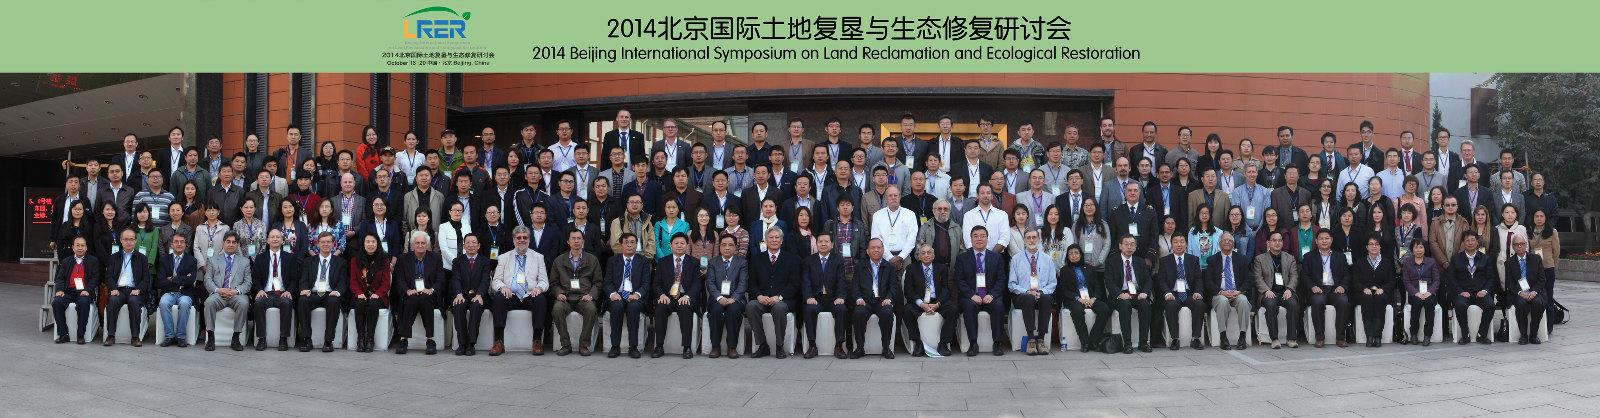 beijing-lrer-2014-s